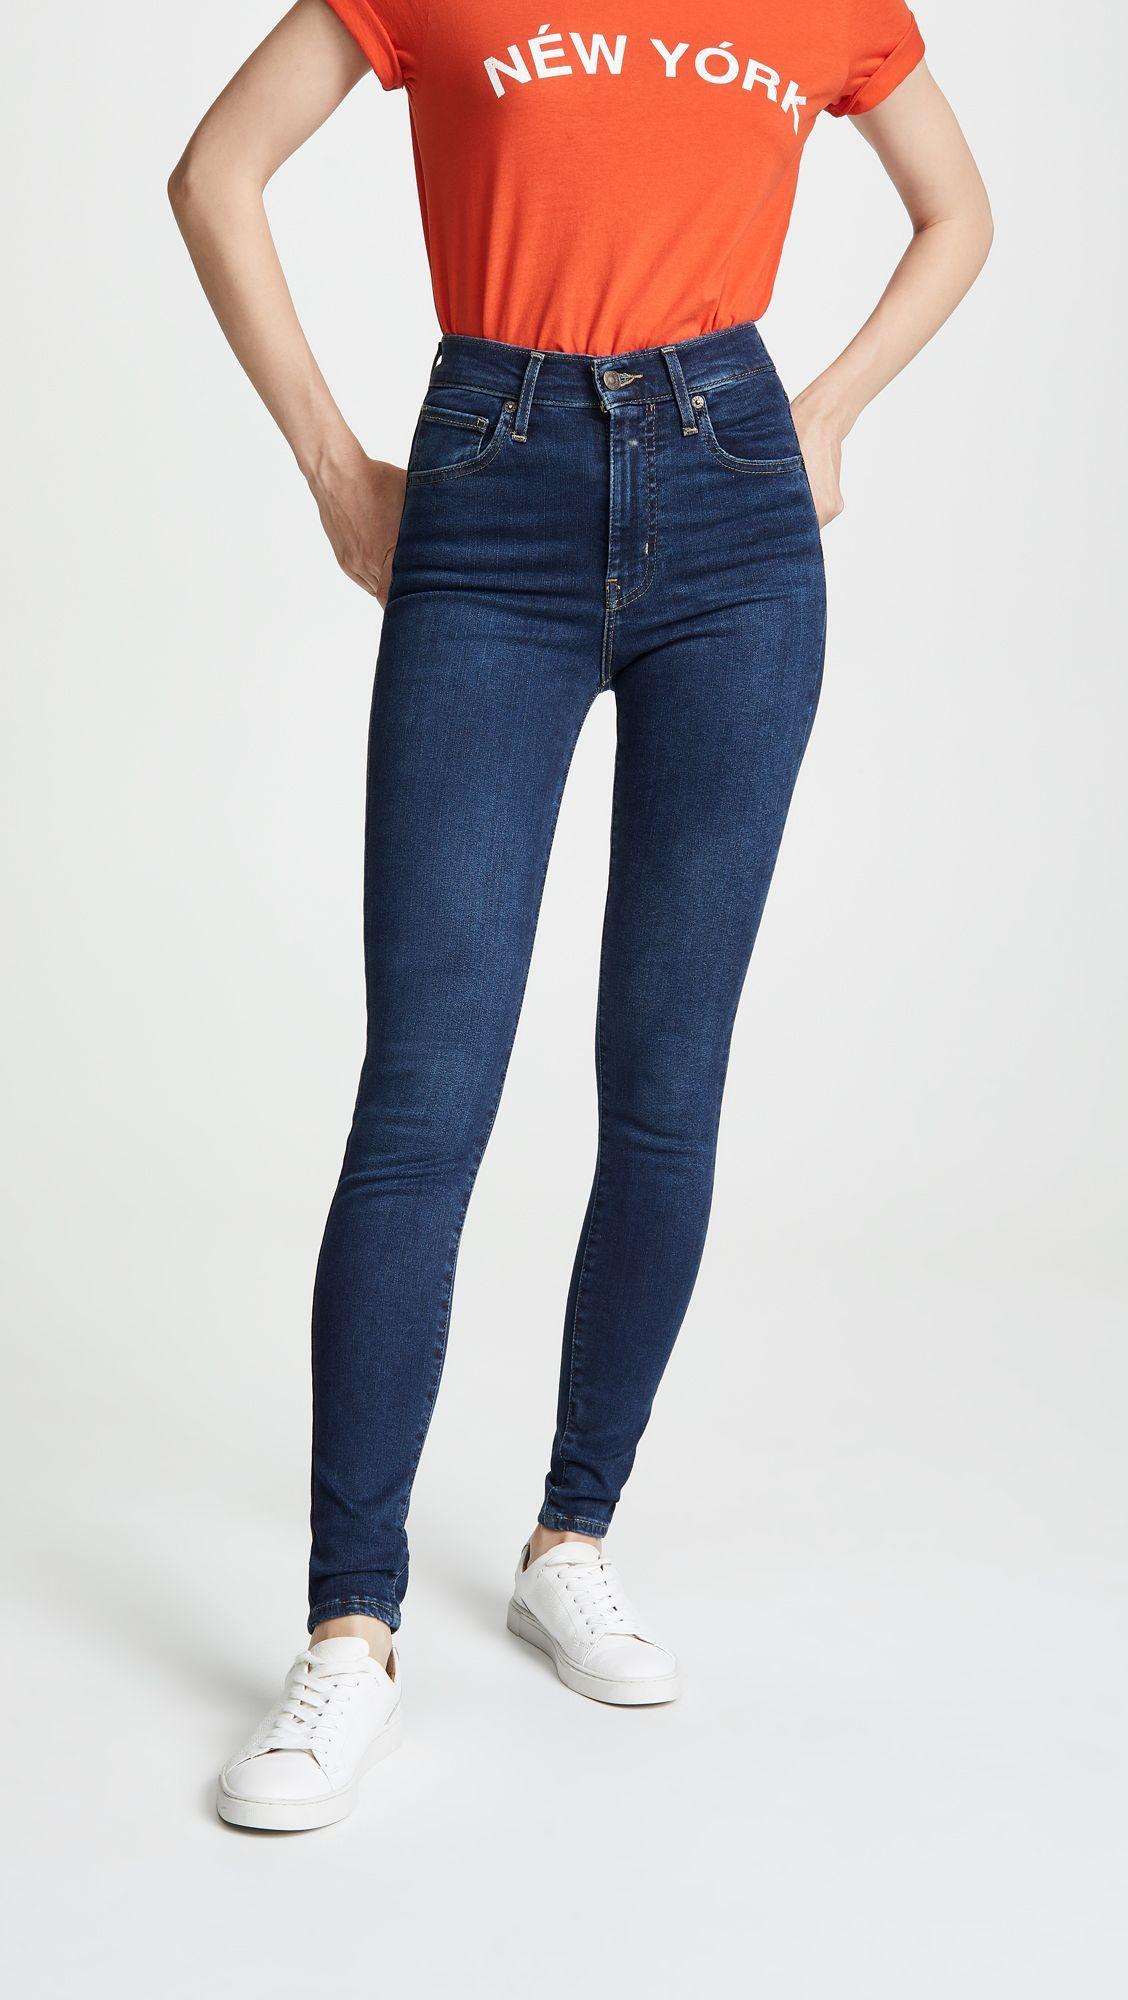 Levi S Mile High Super Skinny Jeans Jeans De Moda Pantalones Skinny Mujer Pantalones De Moda